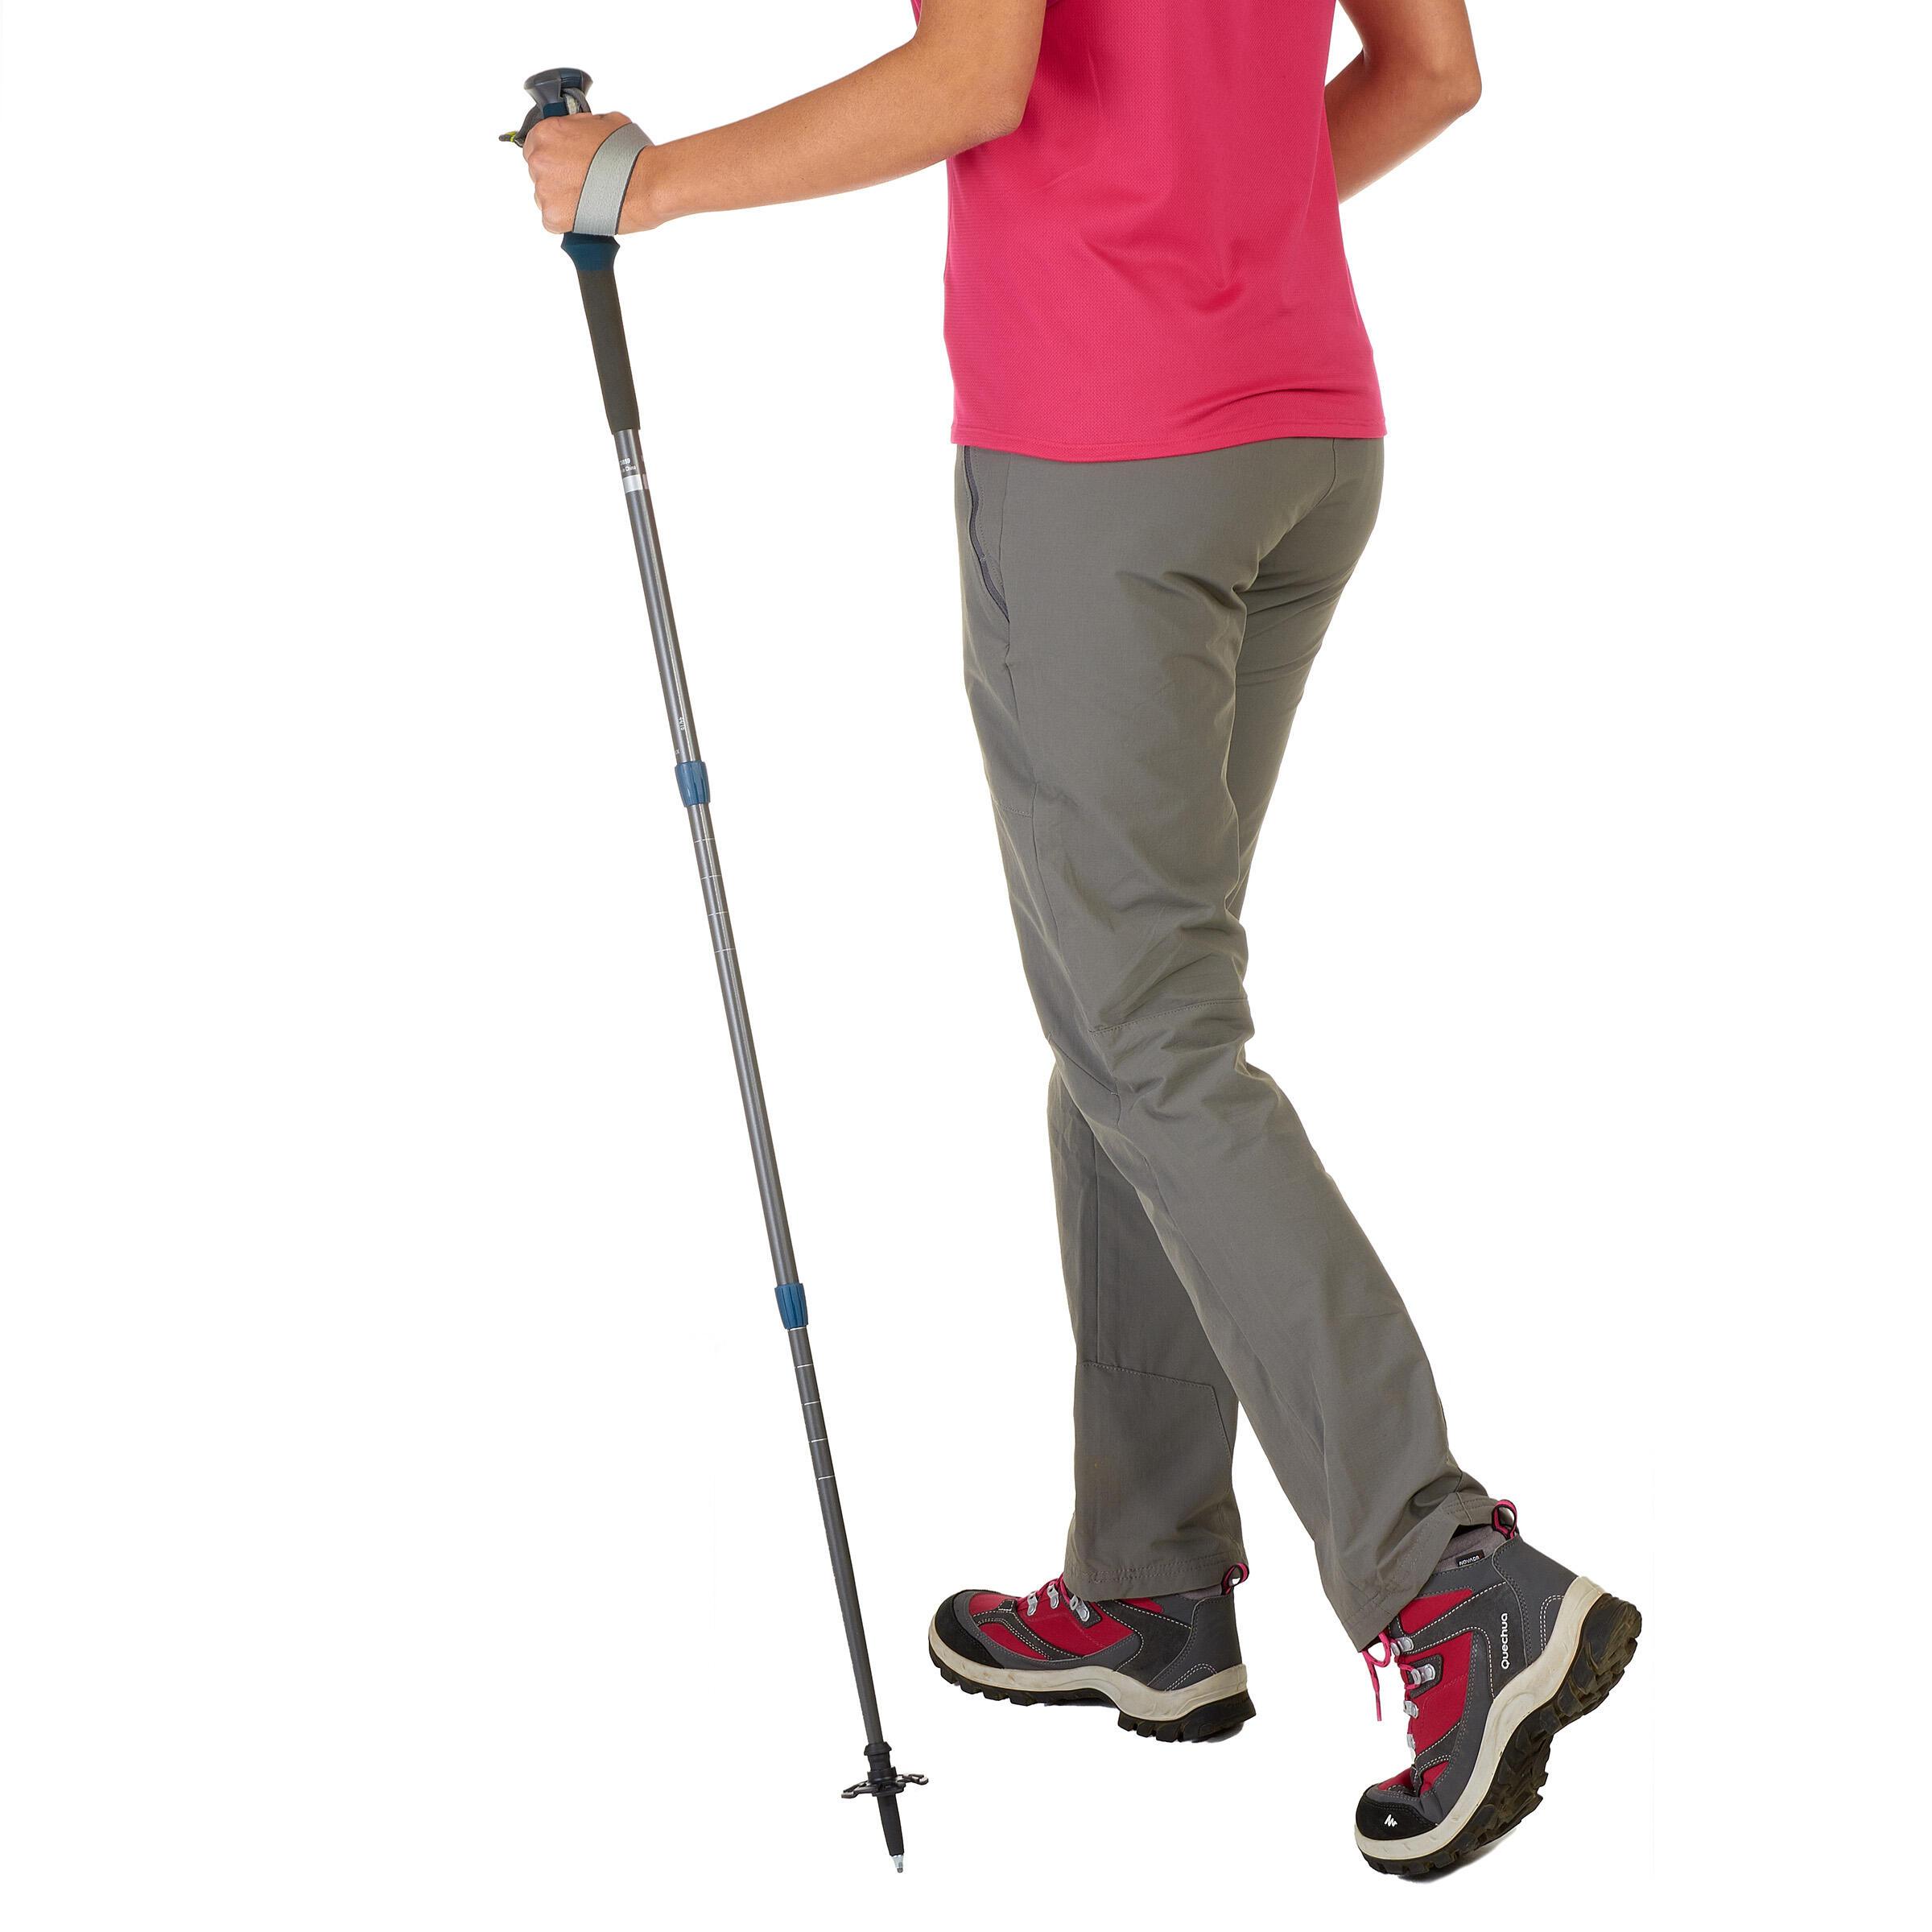 1 x Forclaz 500 Antishock Hiking Pole - Grey/Blue